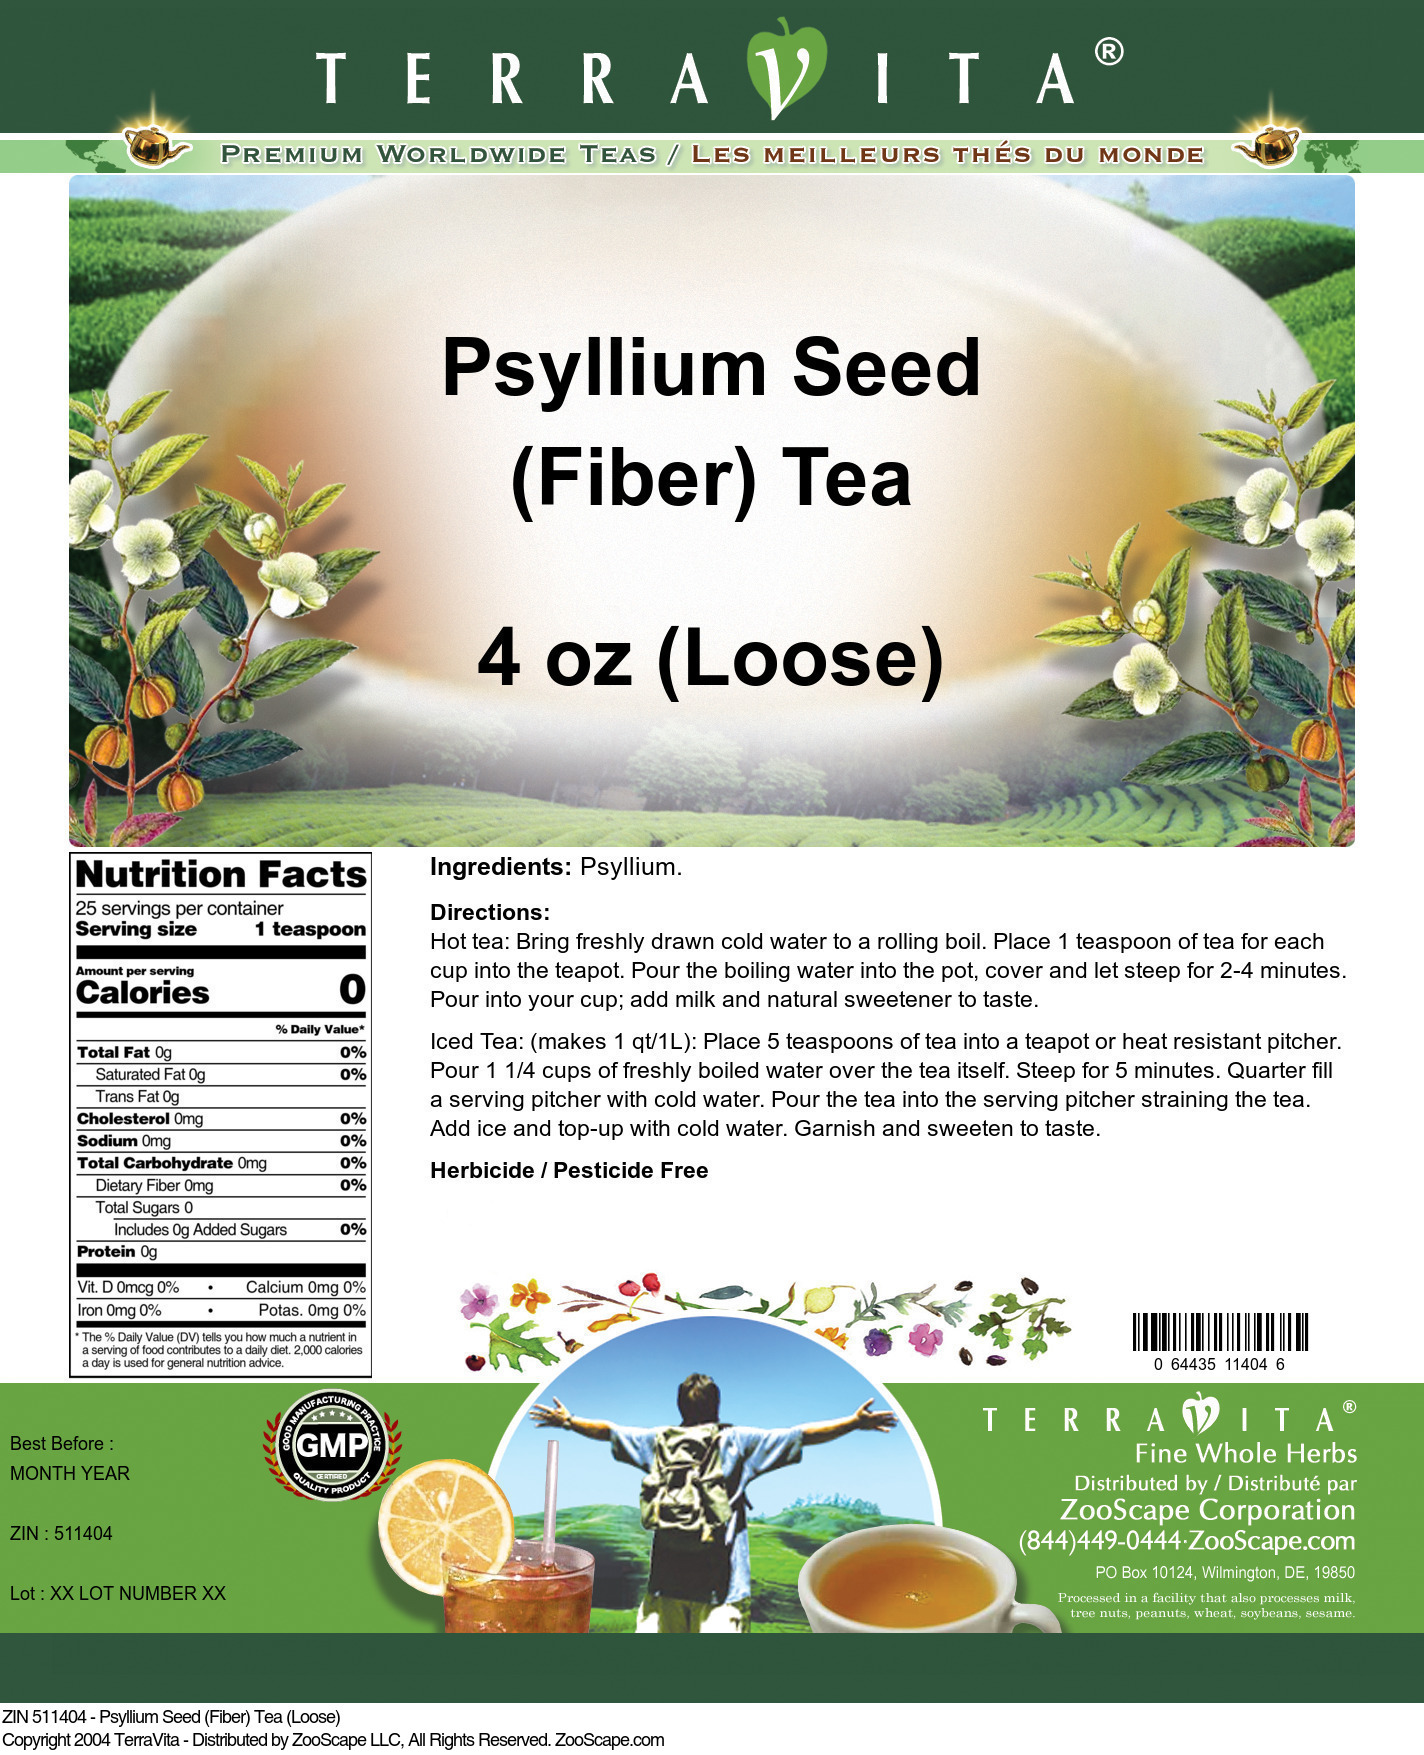 Psyllium Seed (Fiber) Tea (Loose)